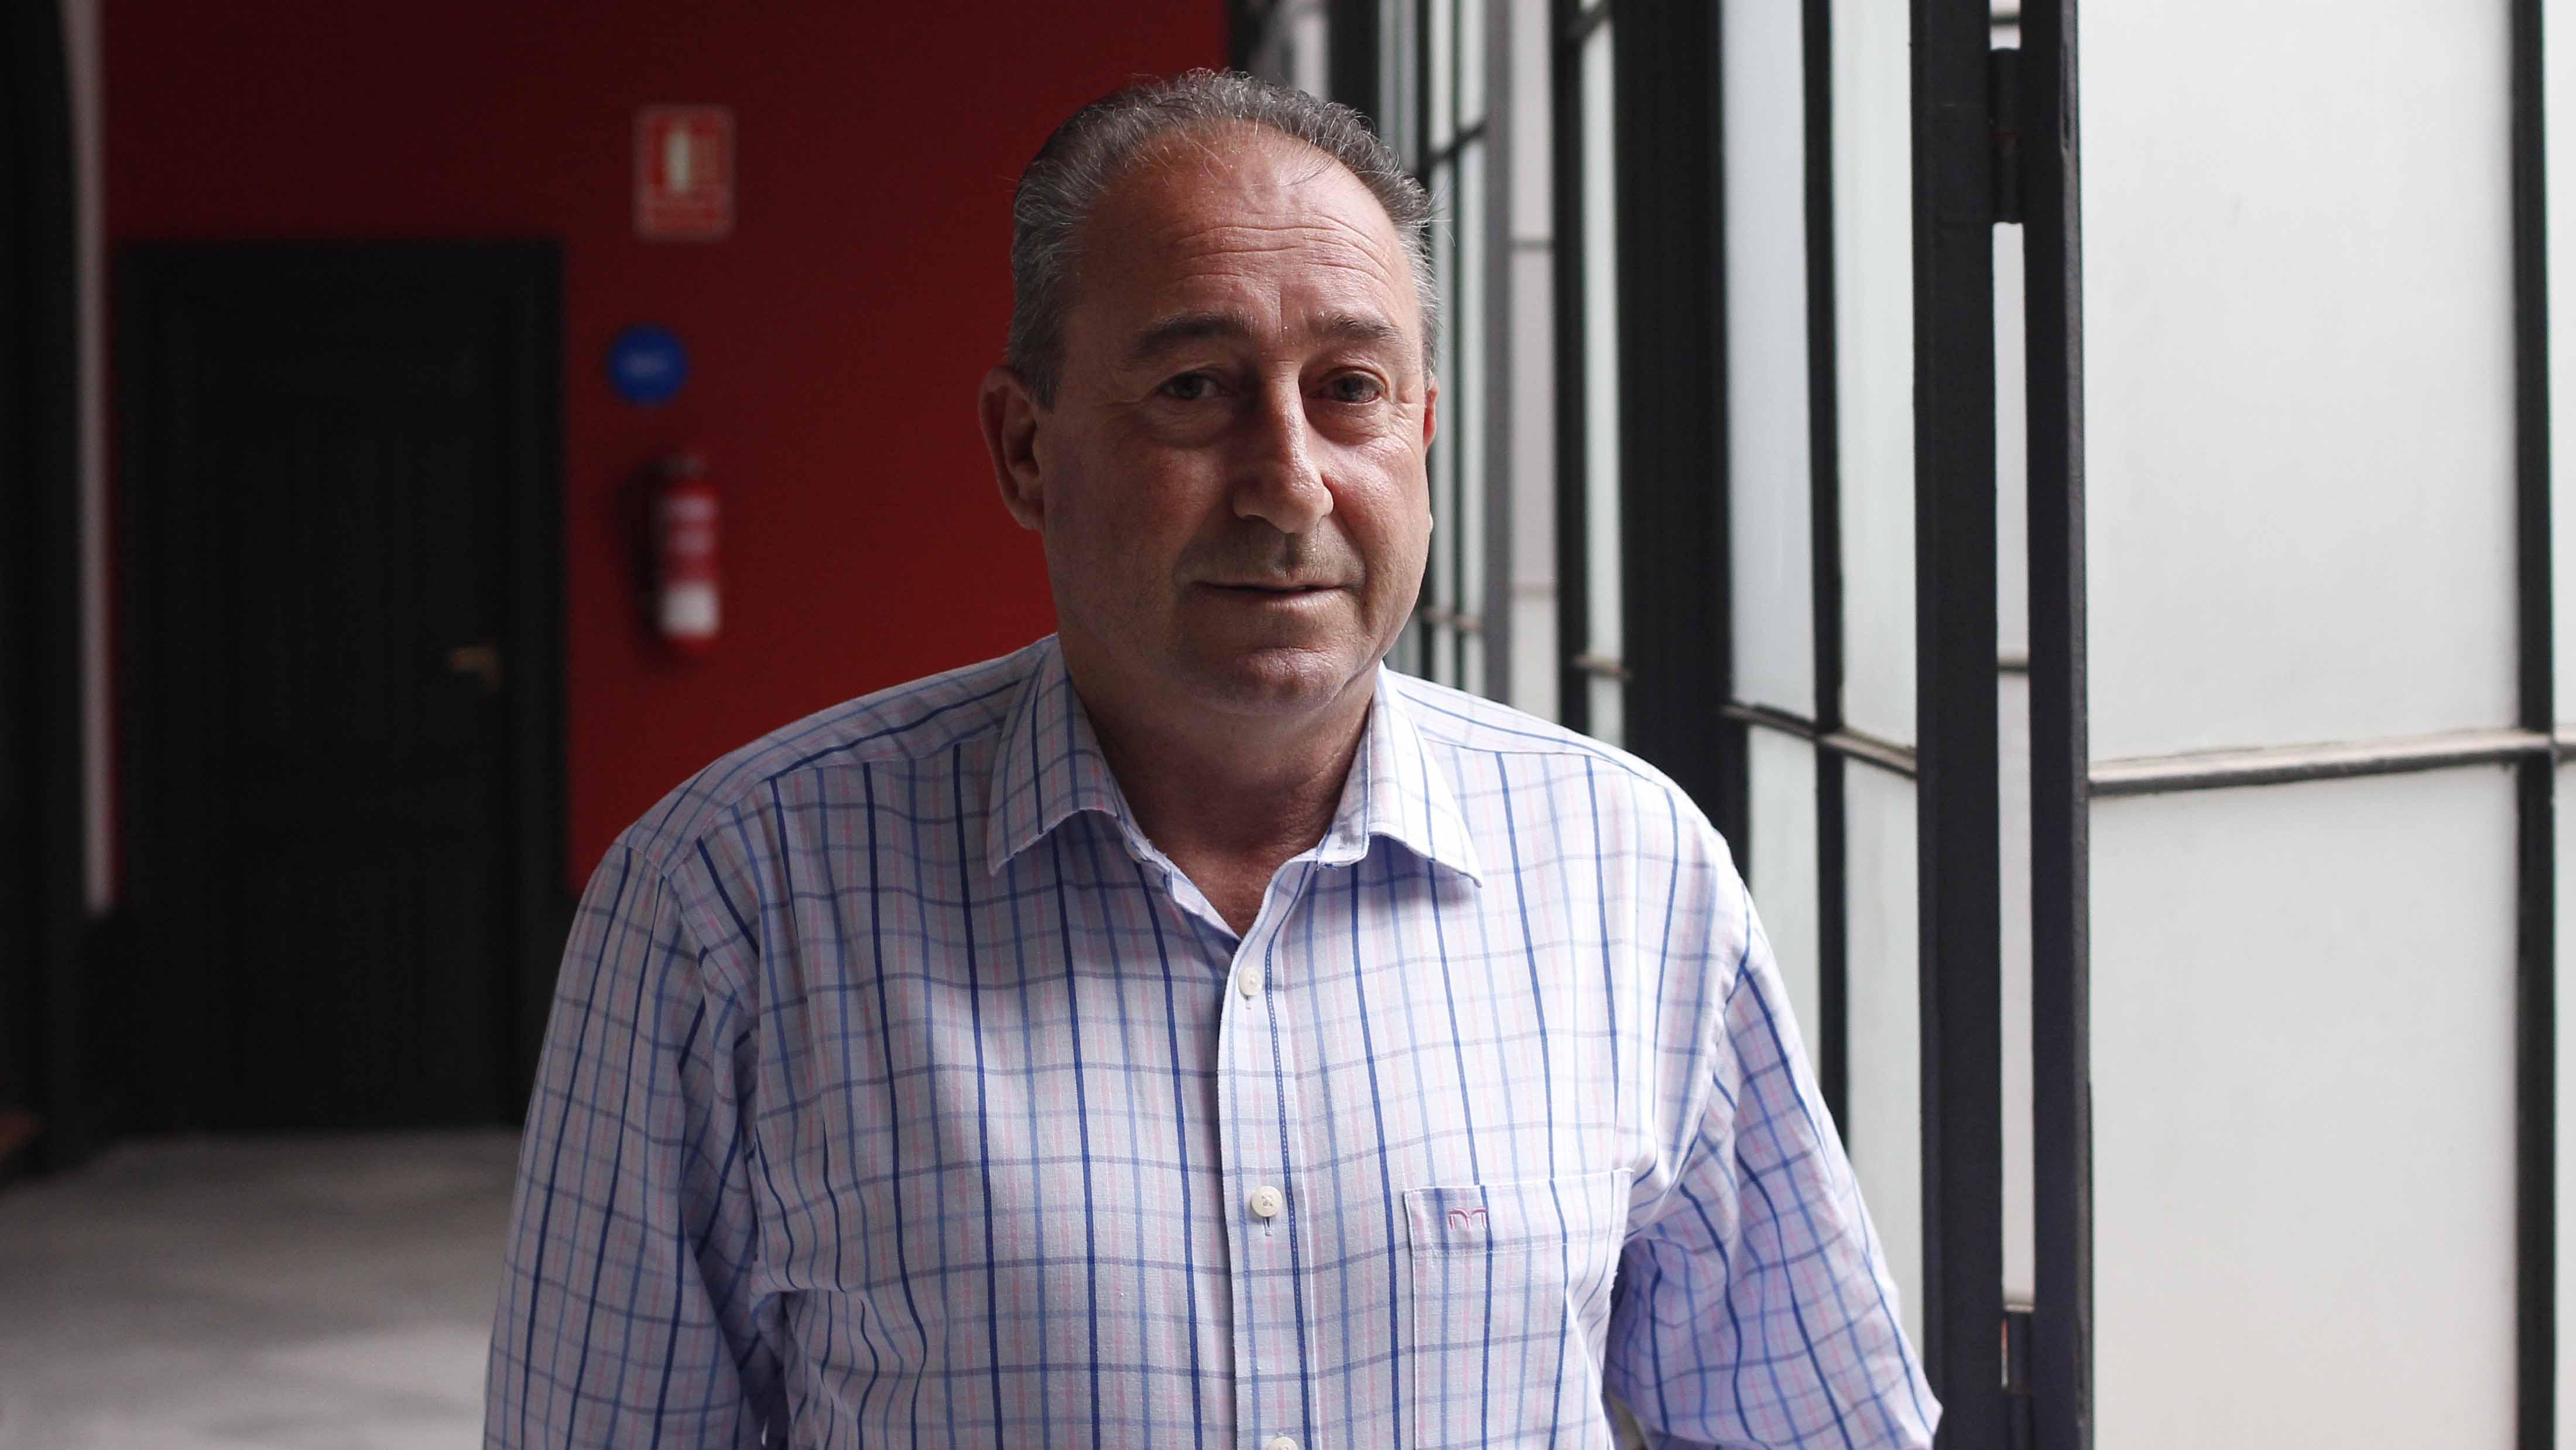 El concejal utrerano Vicente Llorca